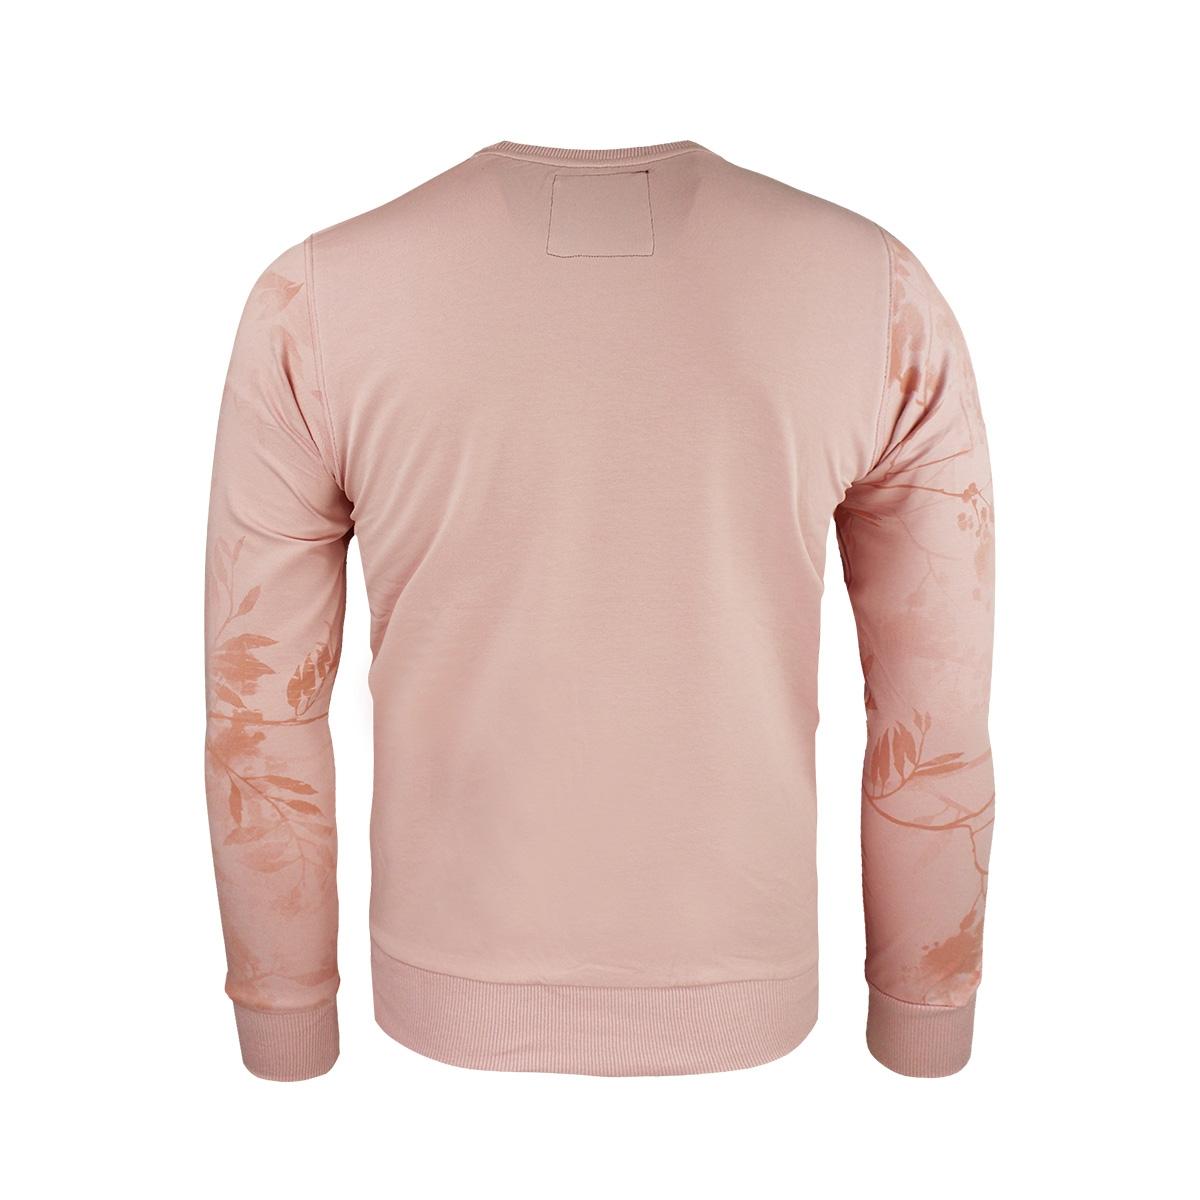 77071 gabbiano sweater pink